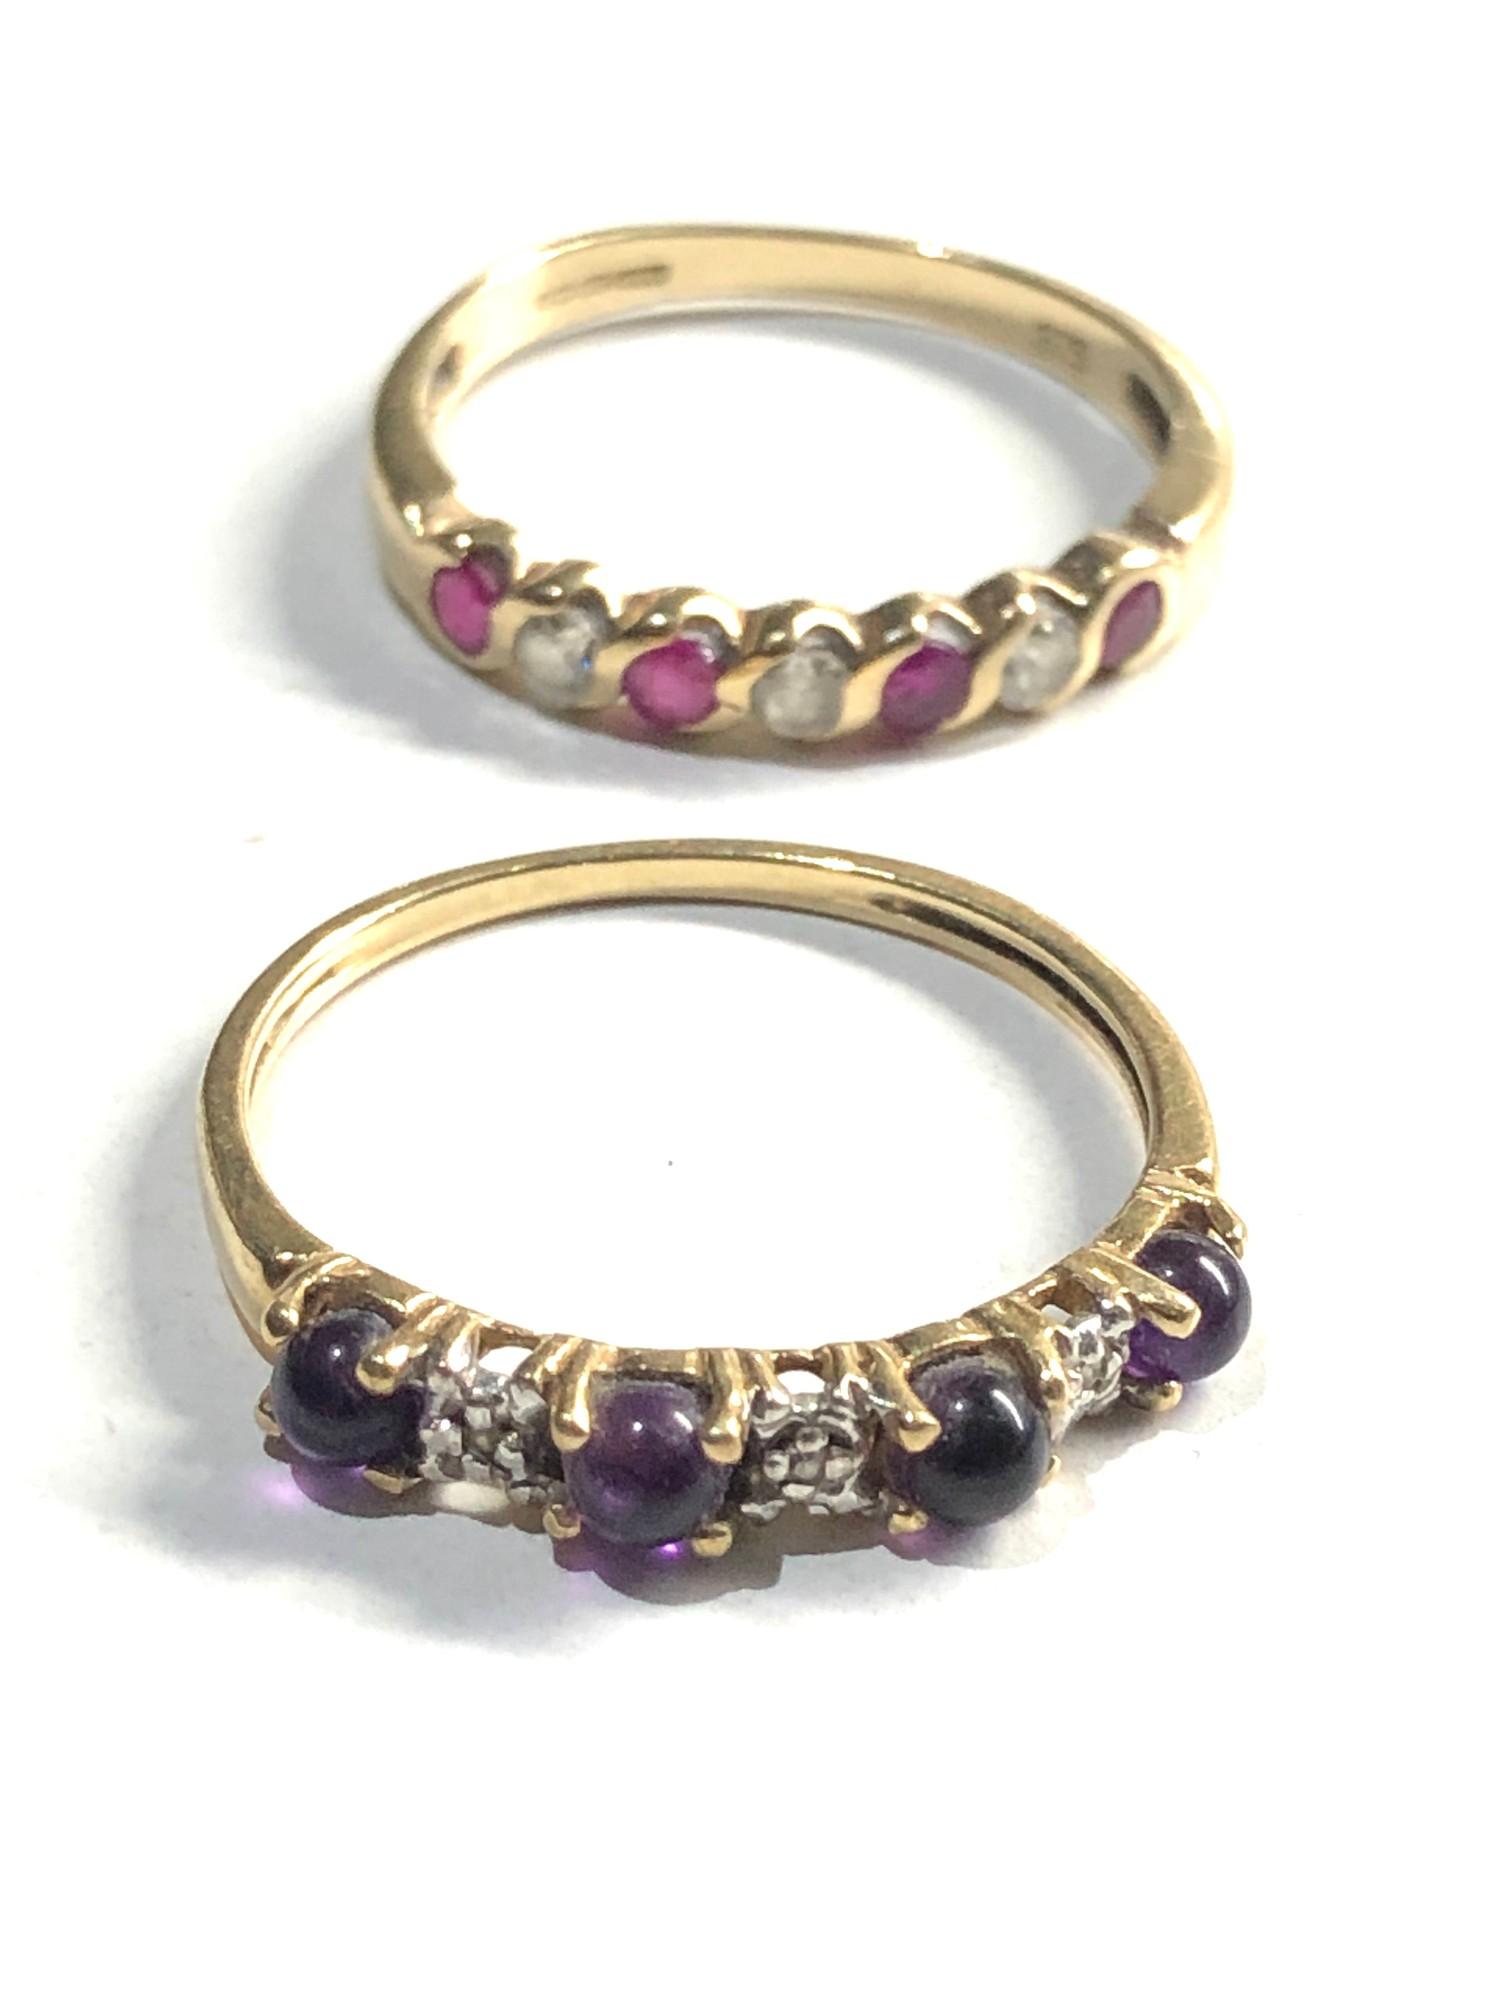 2 x 9ct Gold seven stone rings inc. ruby, amethyst, diamond 3.2g - Image 2 of 3